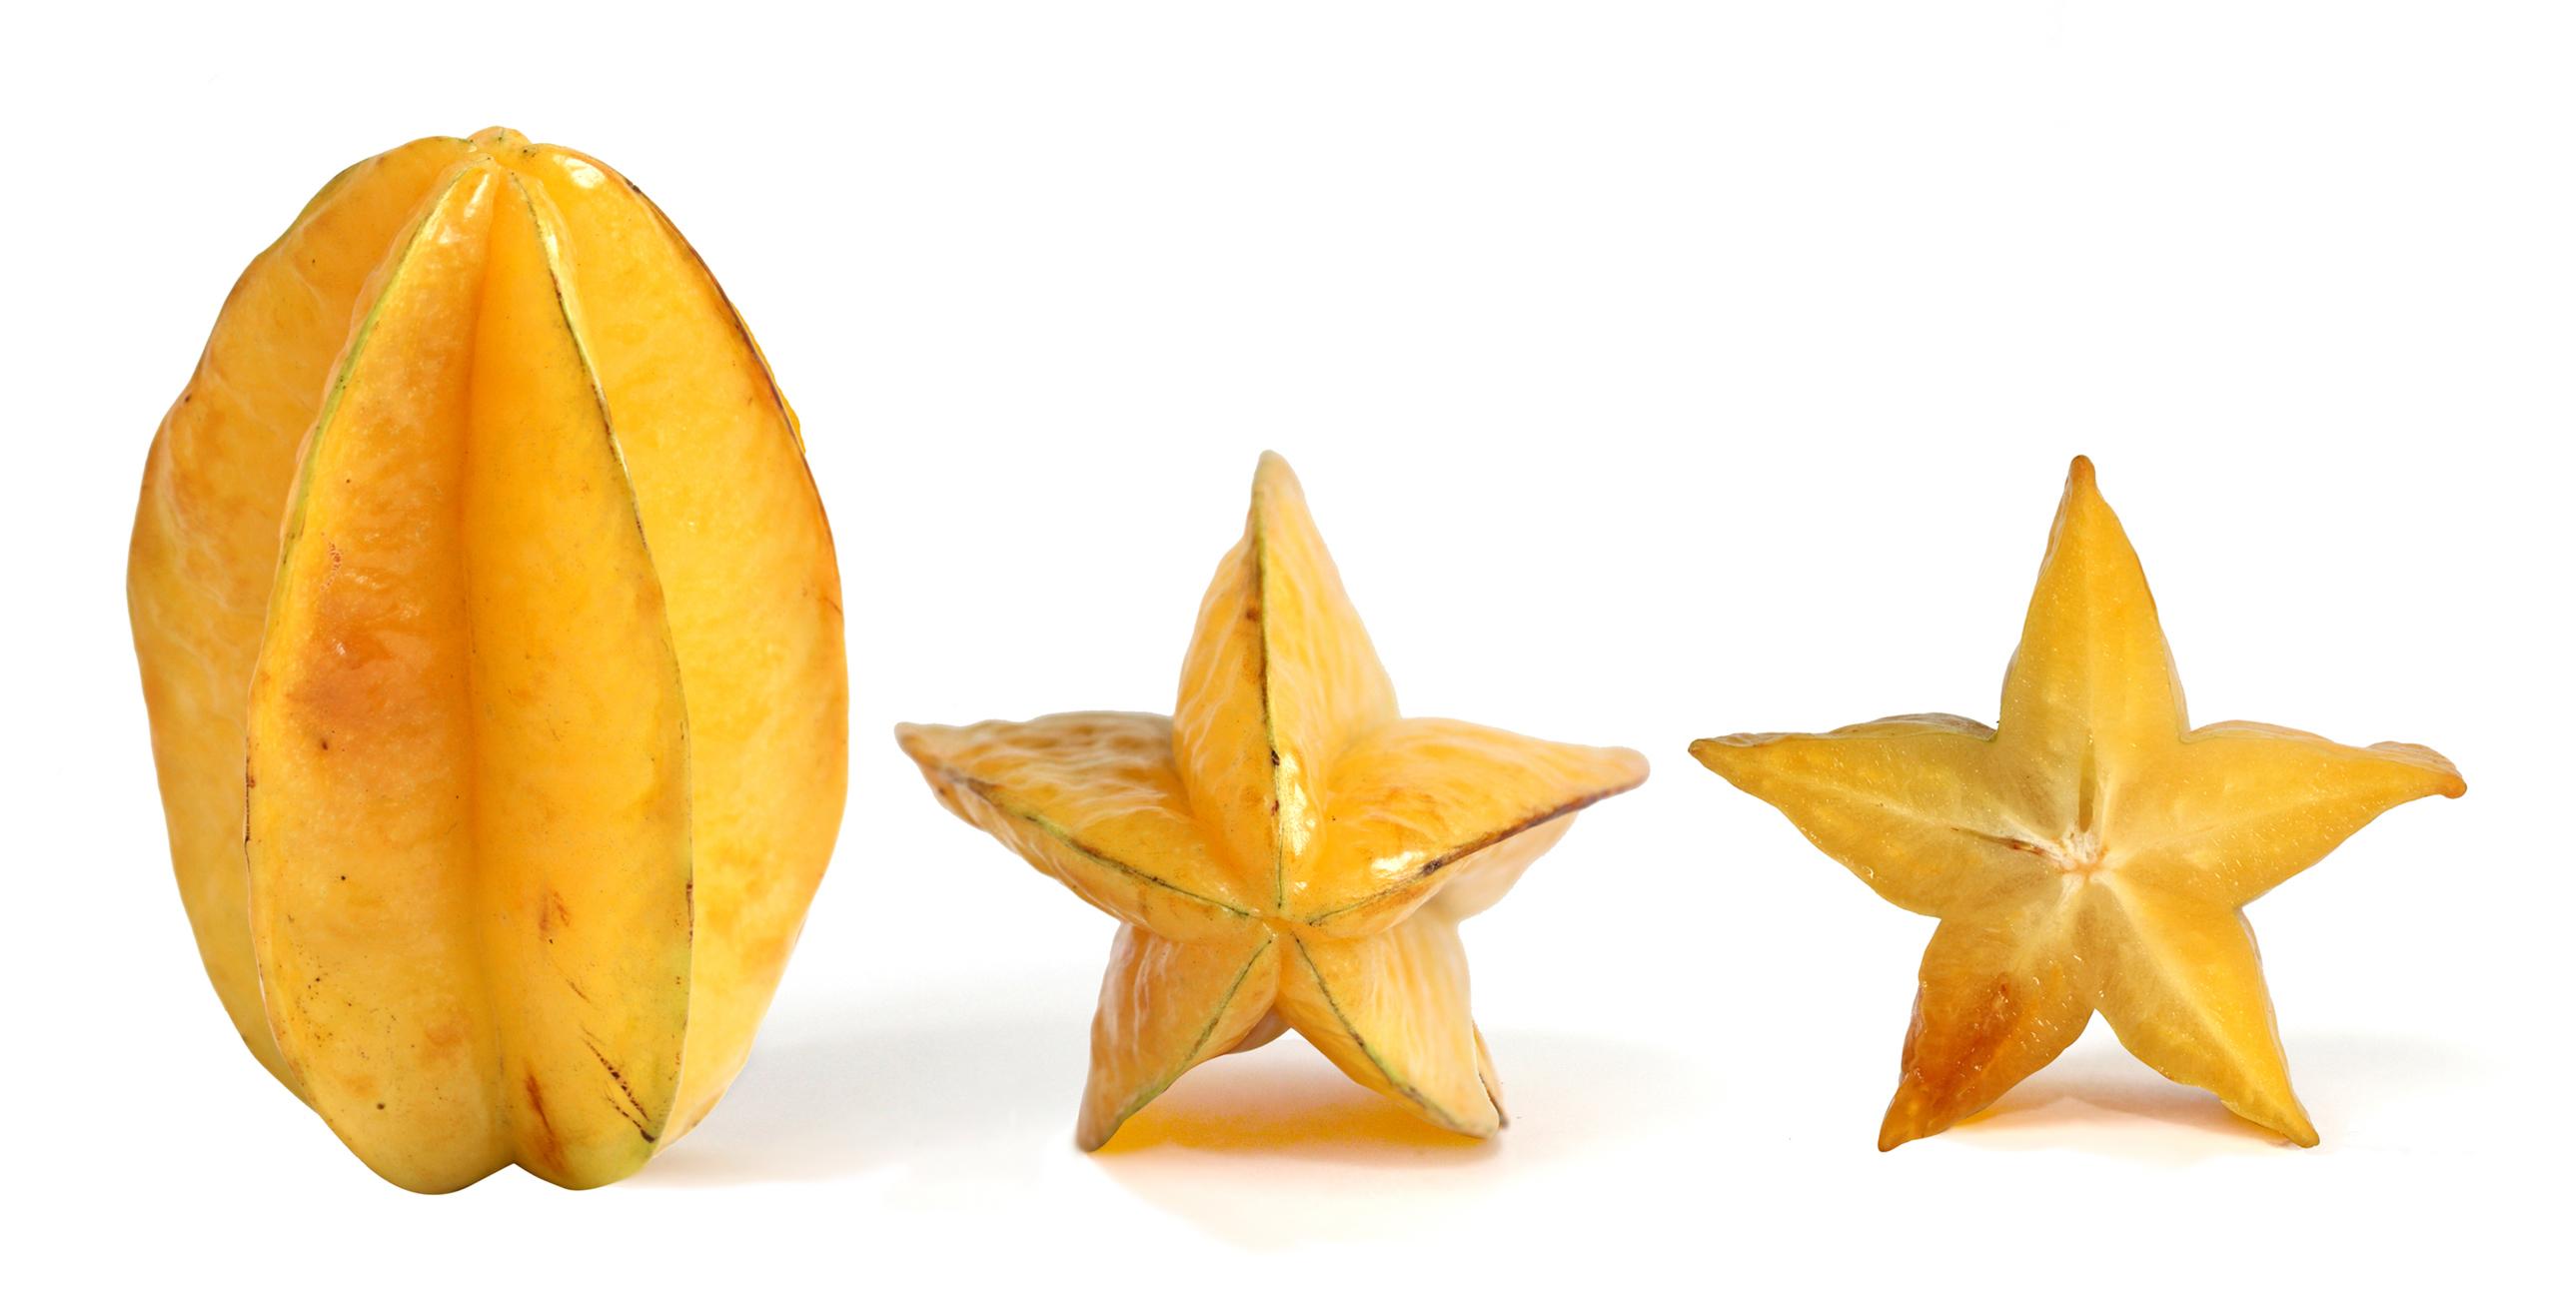 carambola_starfruit